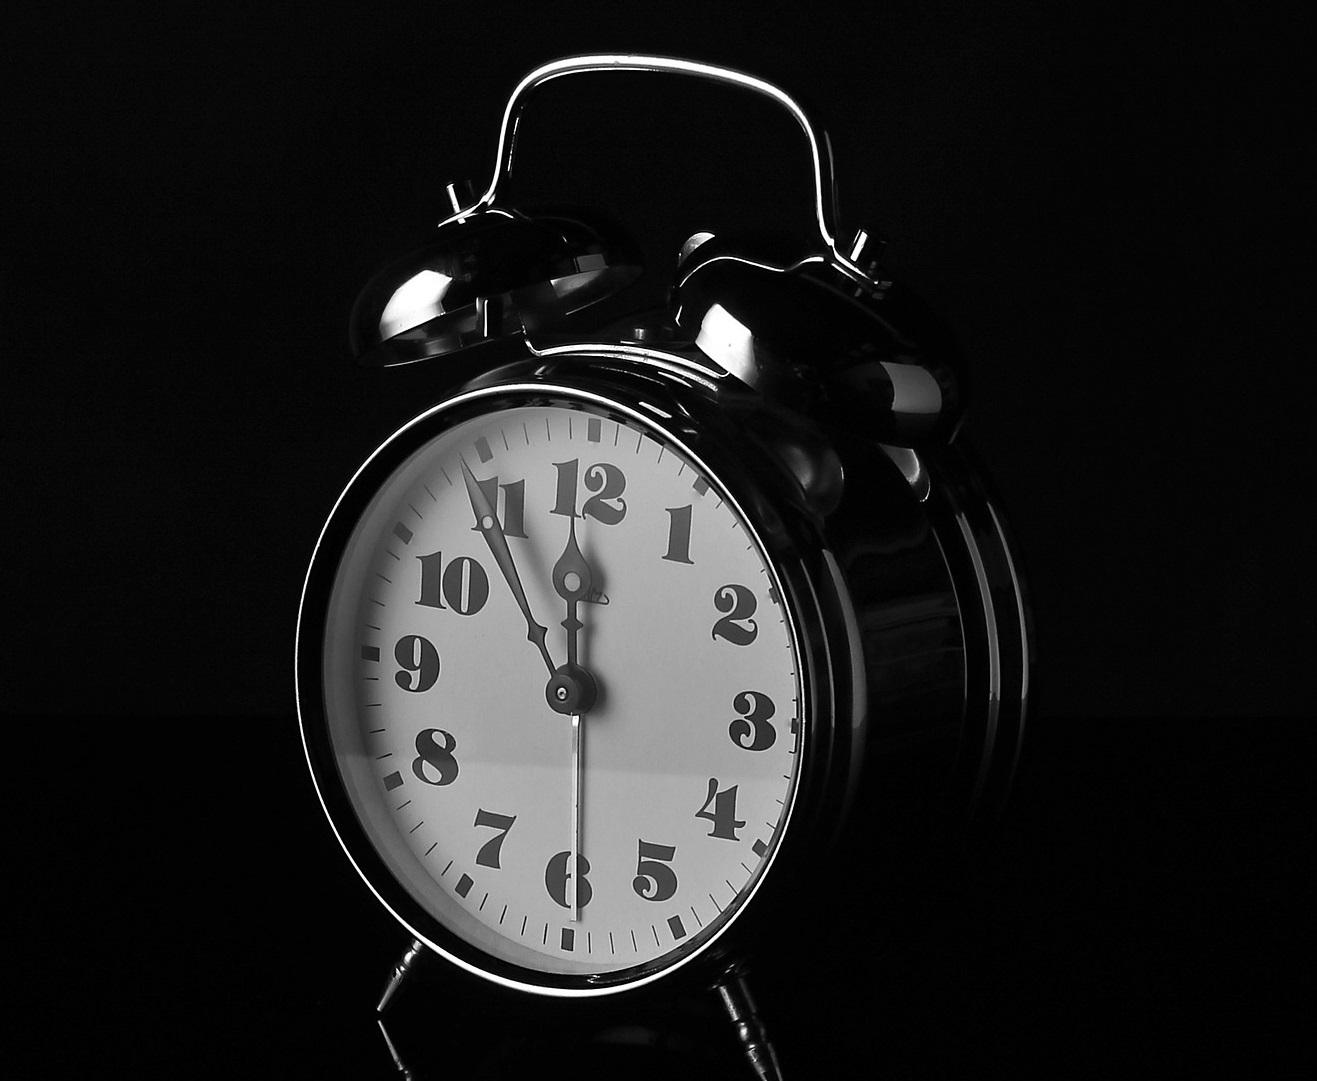 alarm-clock-687580_1920 for online